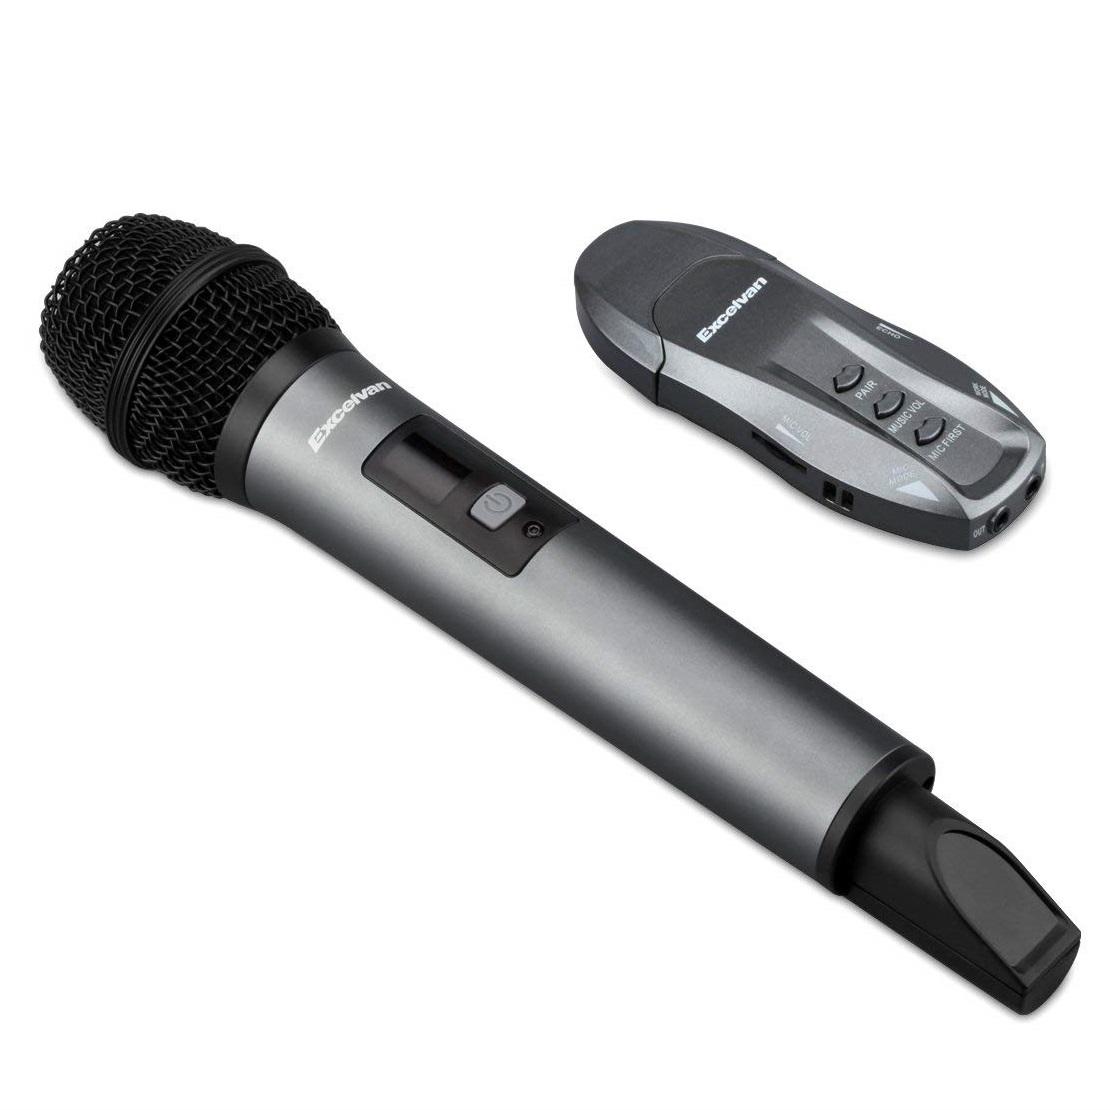 Microphone Excelvan K18V Bluetooth